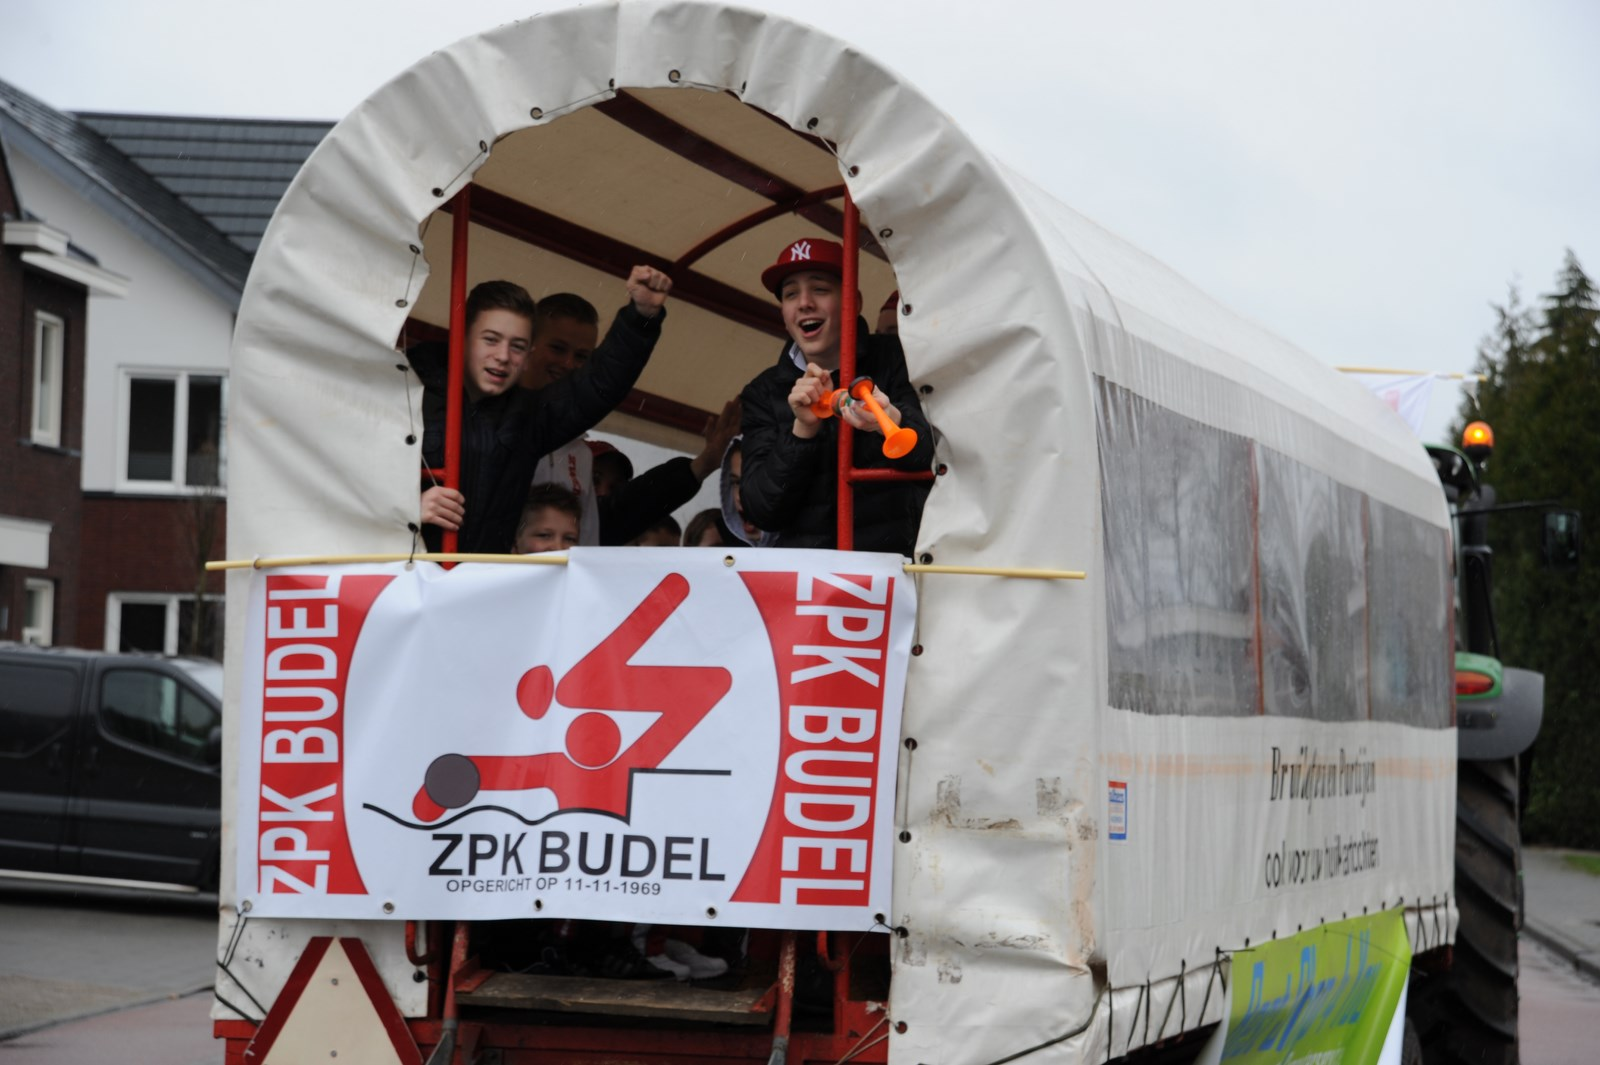 ZPK Budel kampioen 2015